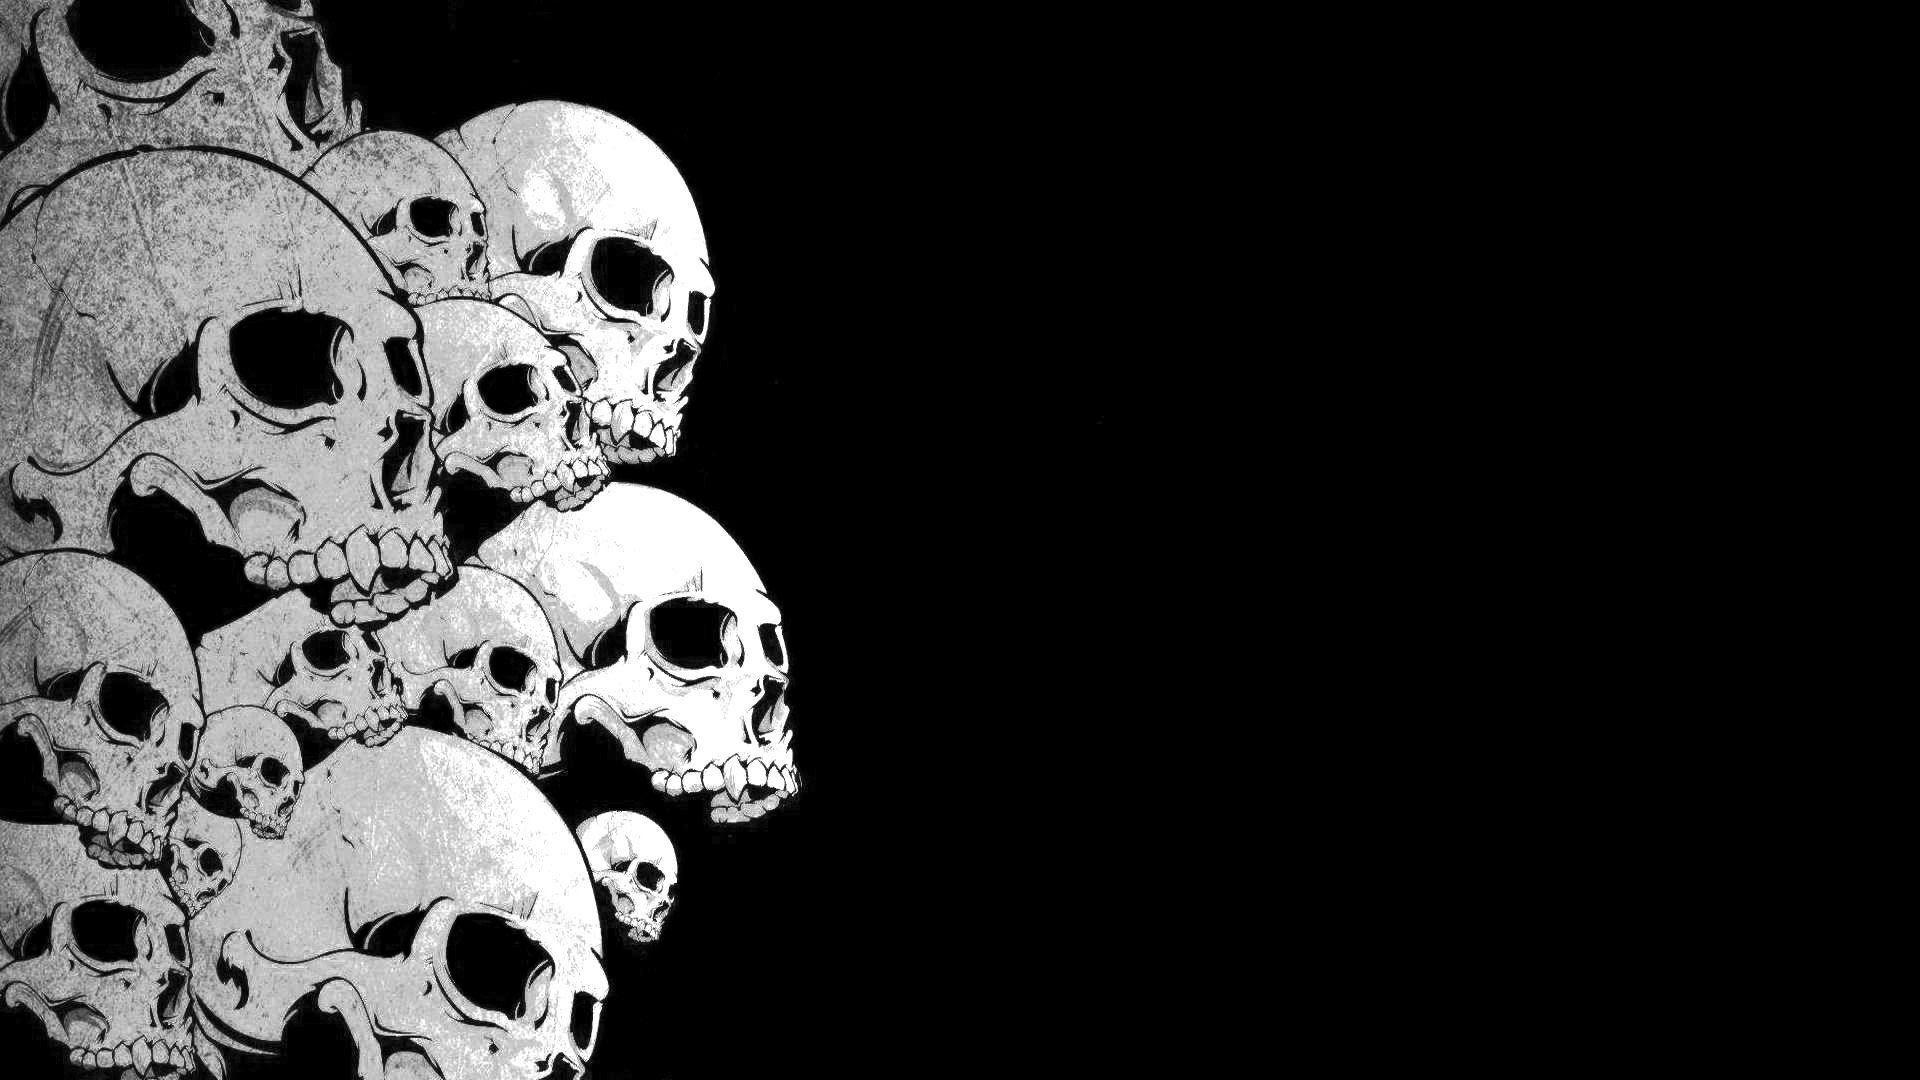 Skull Wallpaper 65 Images